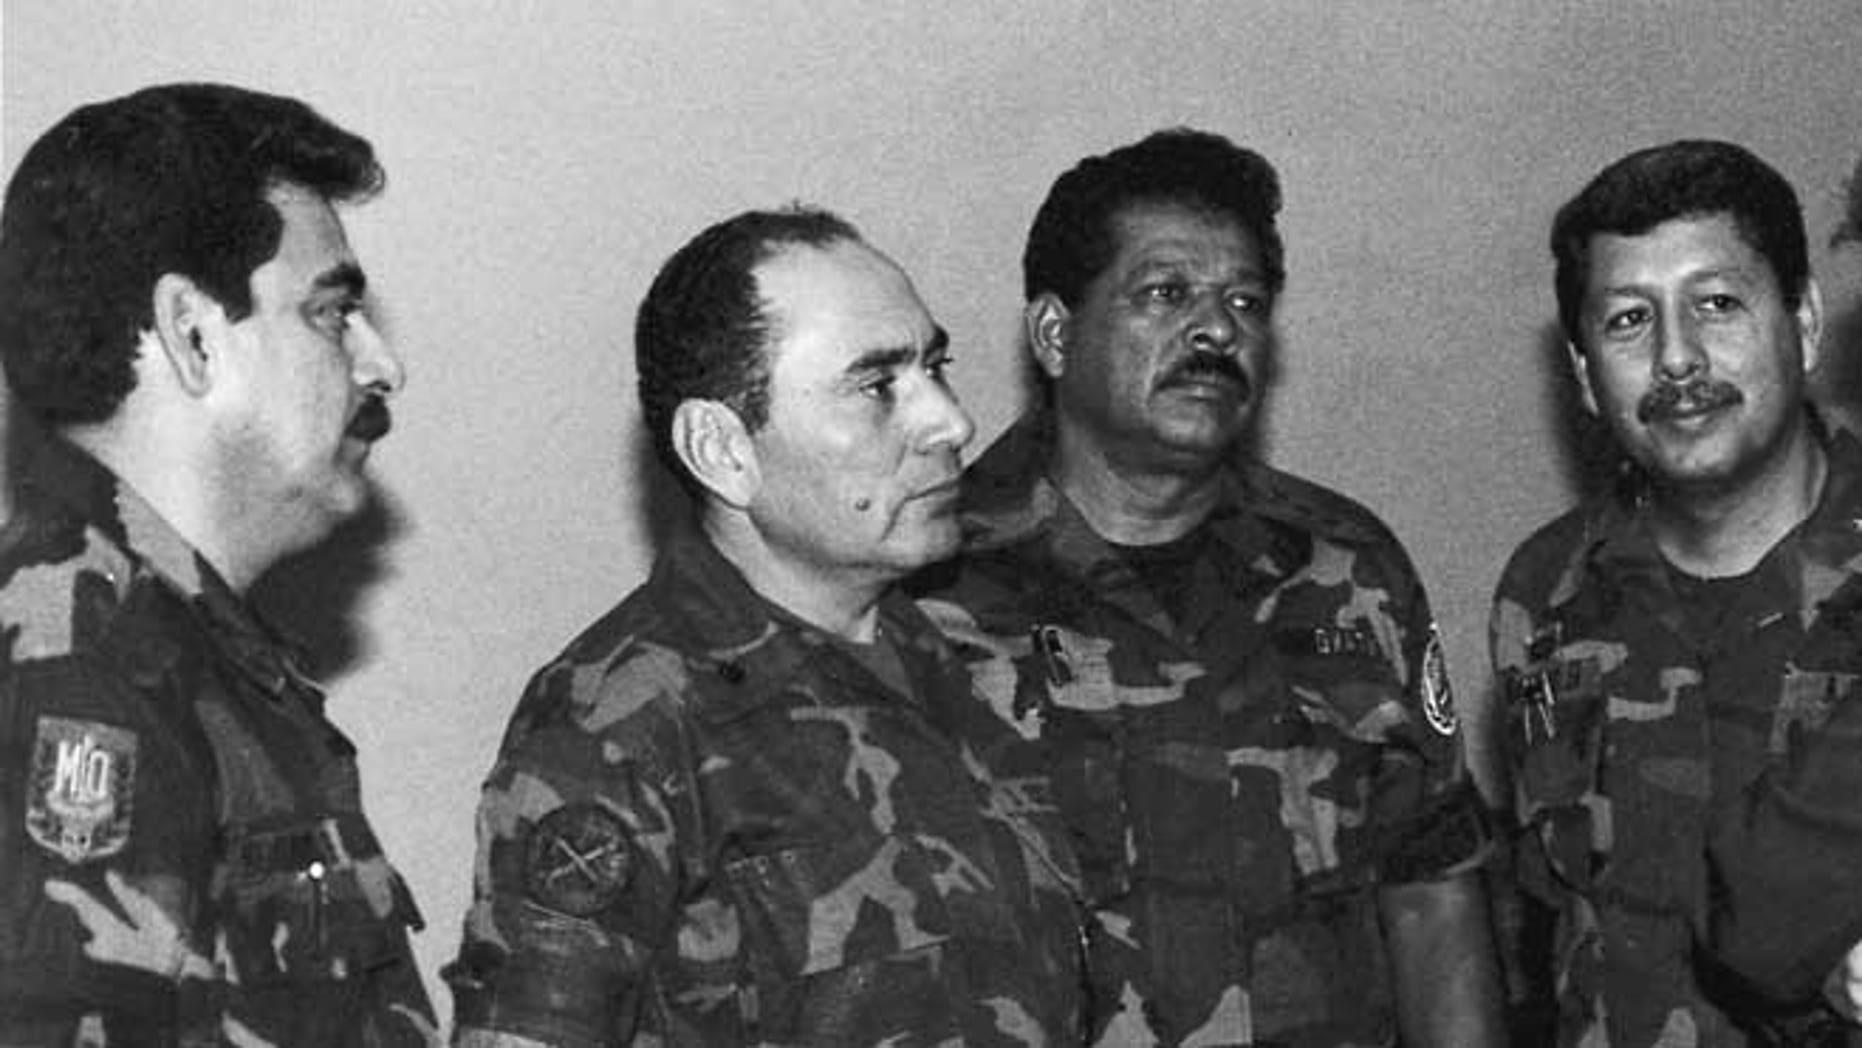 Colonels Rene Emilio Ponce, Rafael Humberto Larios, Inocente Orlando Montano and Juan Orlando Zepeda in July 1989.